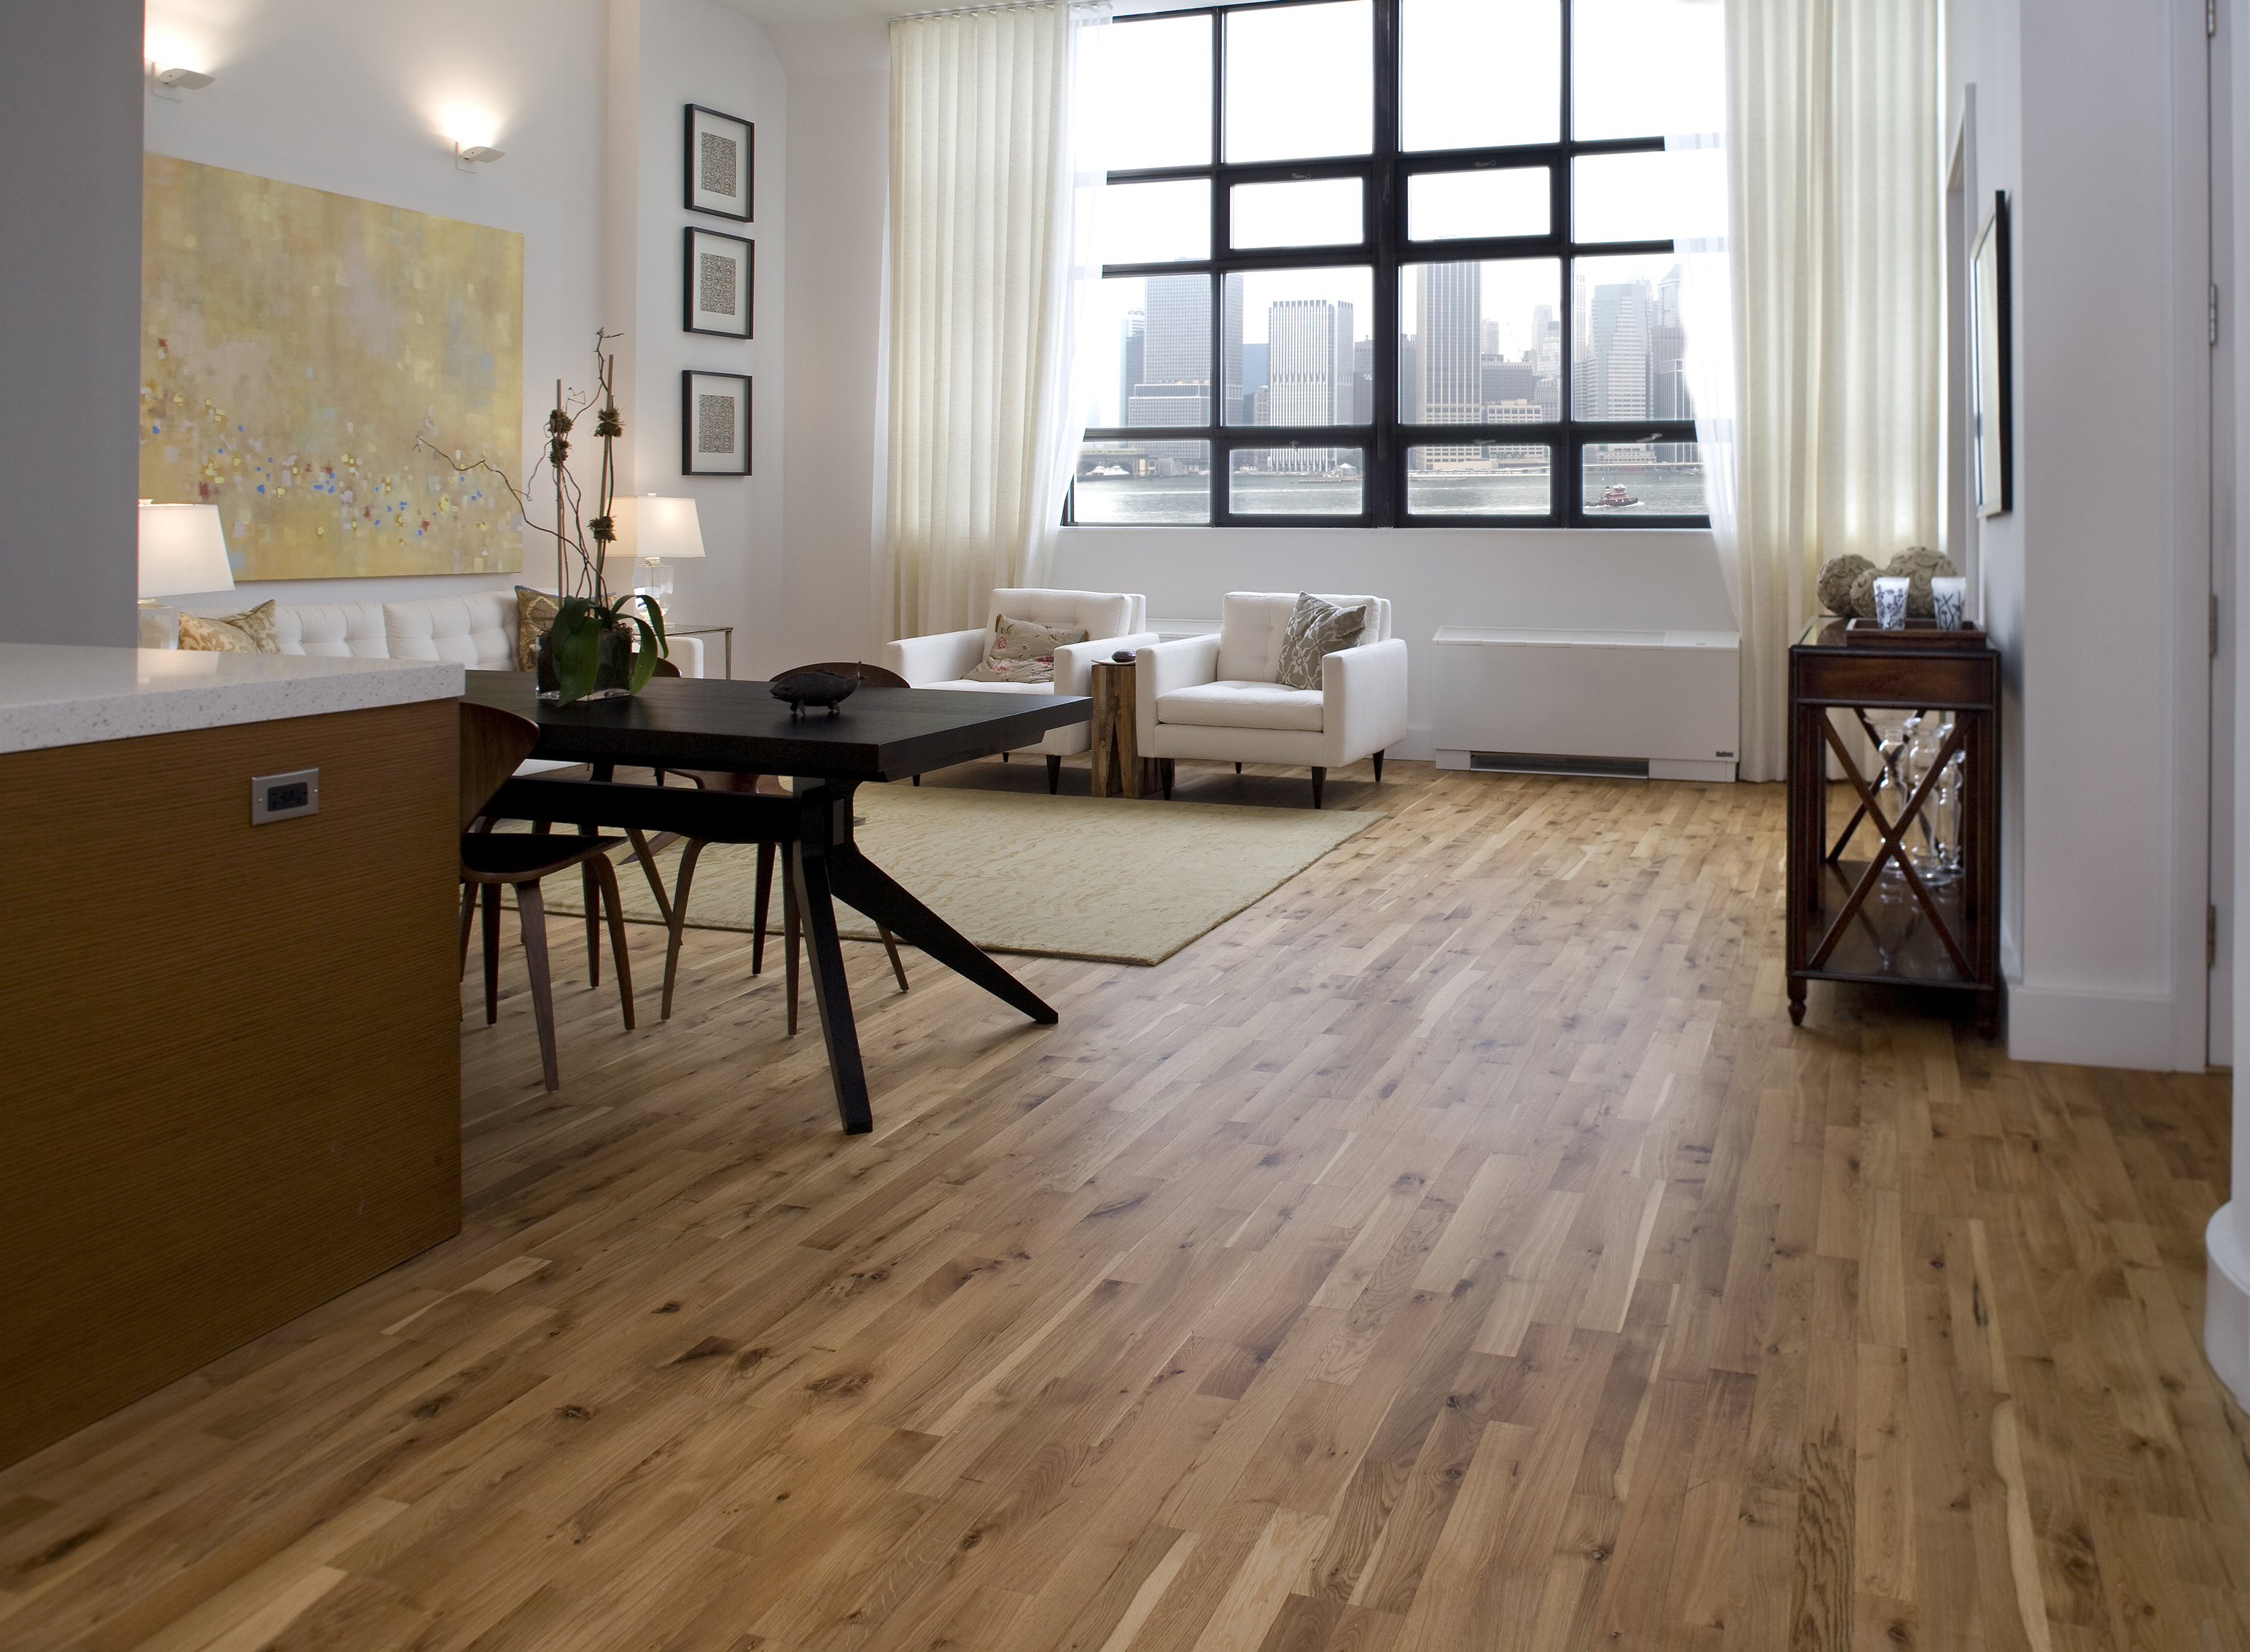 Wood floor for you - Laminate wood flooring in living room ...